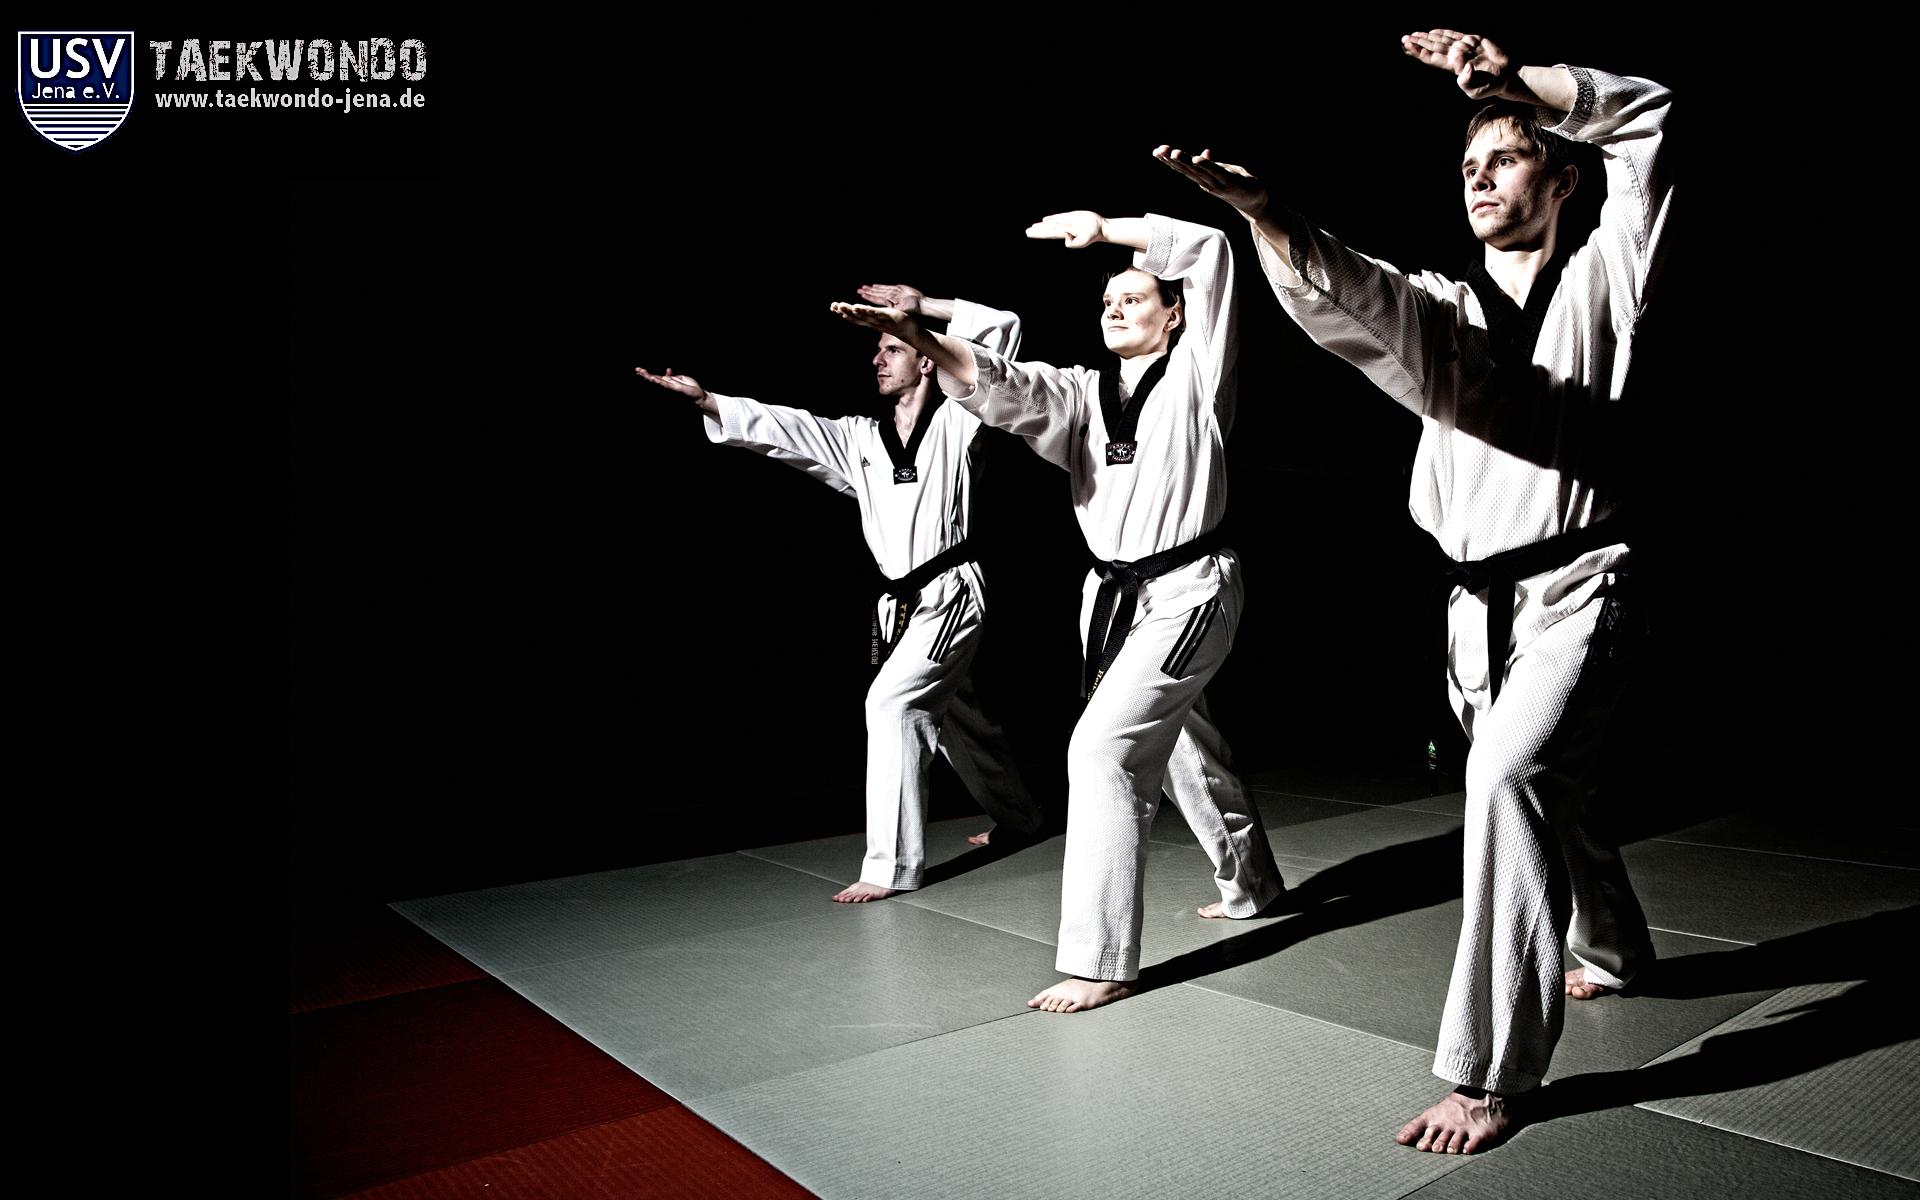 toprakspo taekwondo wallpaper 18jpg 1920x1200